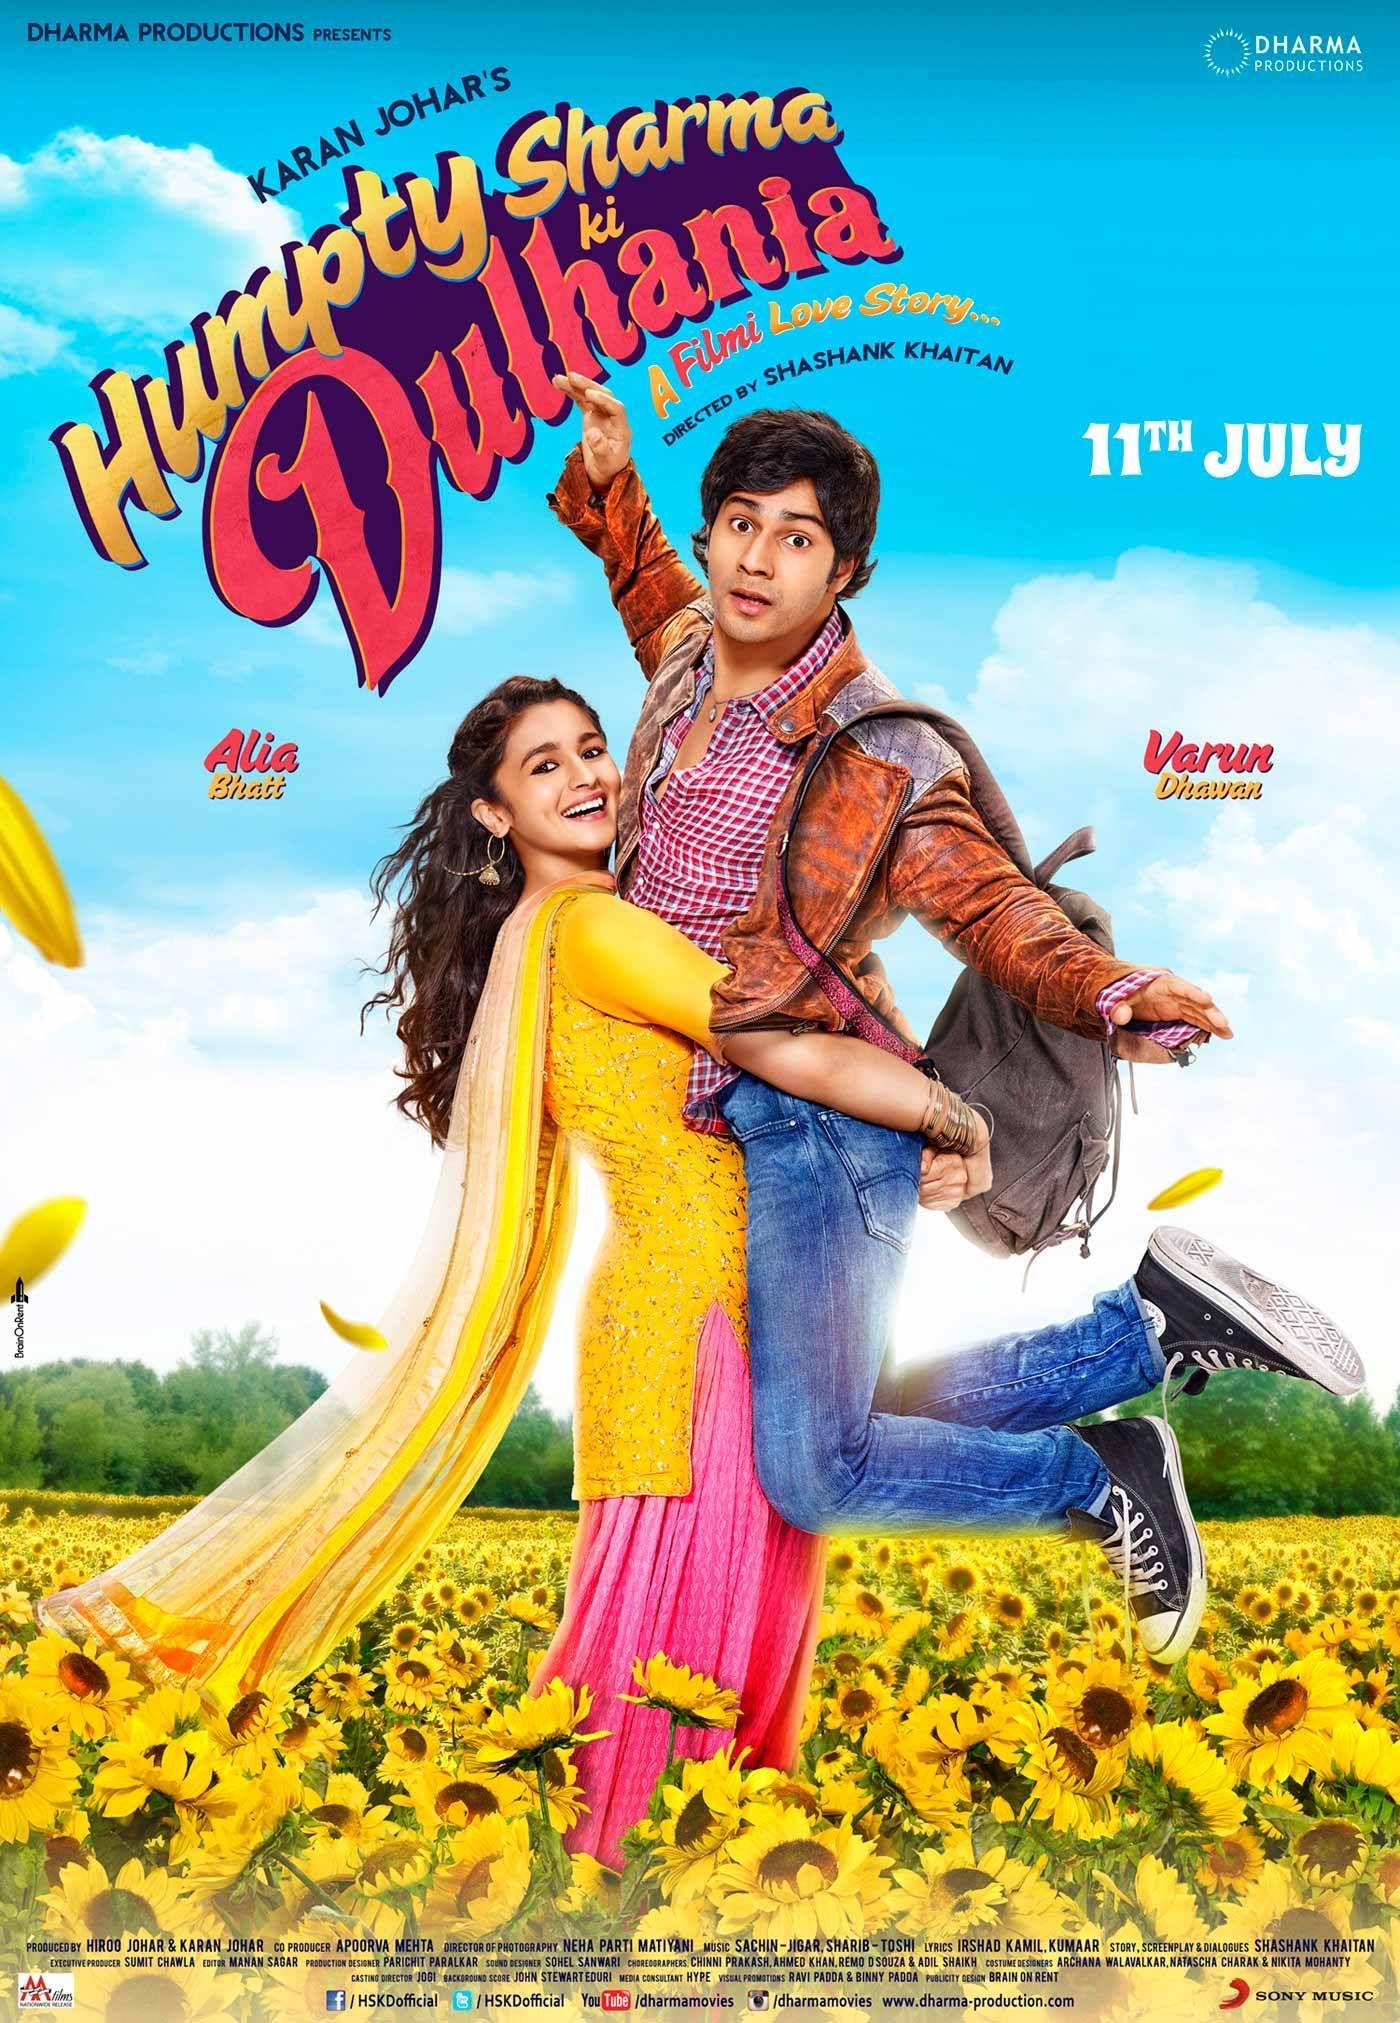 Humpty Sharma Ki Dulhania (2014) Hindi movie song